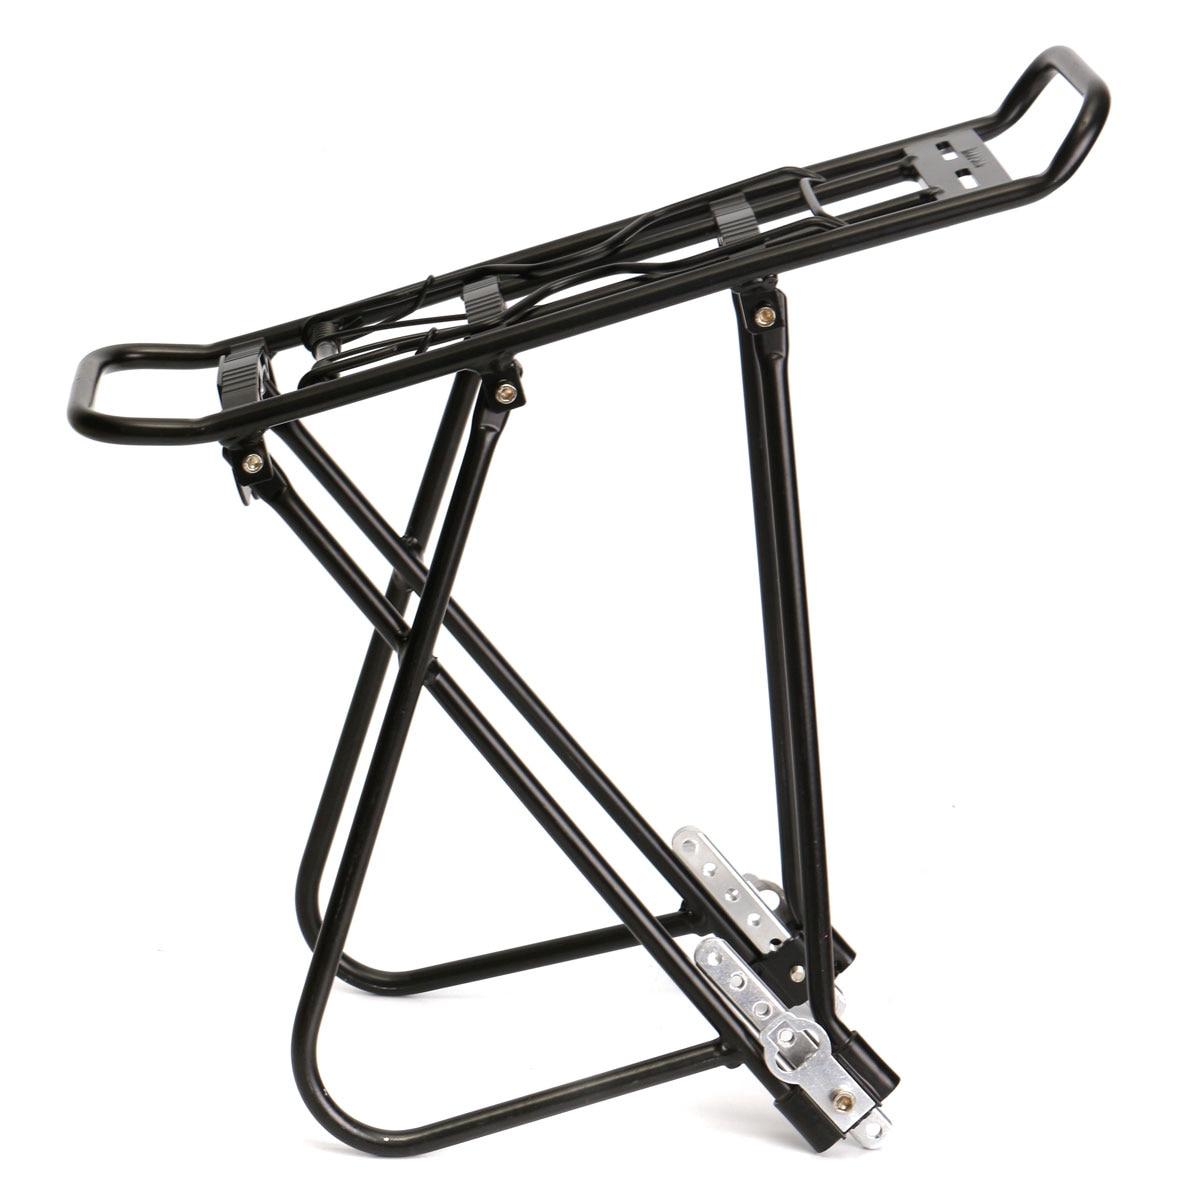 MTB Bicycle Bike Cycling High-strength aluminum alloy Rack Carrier Rear Luggage Cycling Pannier Bag Shelf Bracket<br><br>Aliexpress